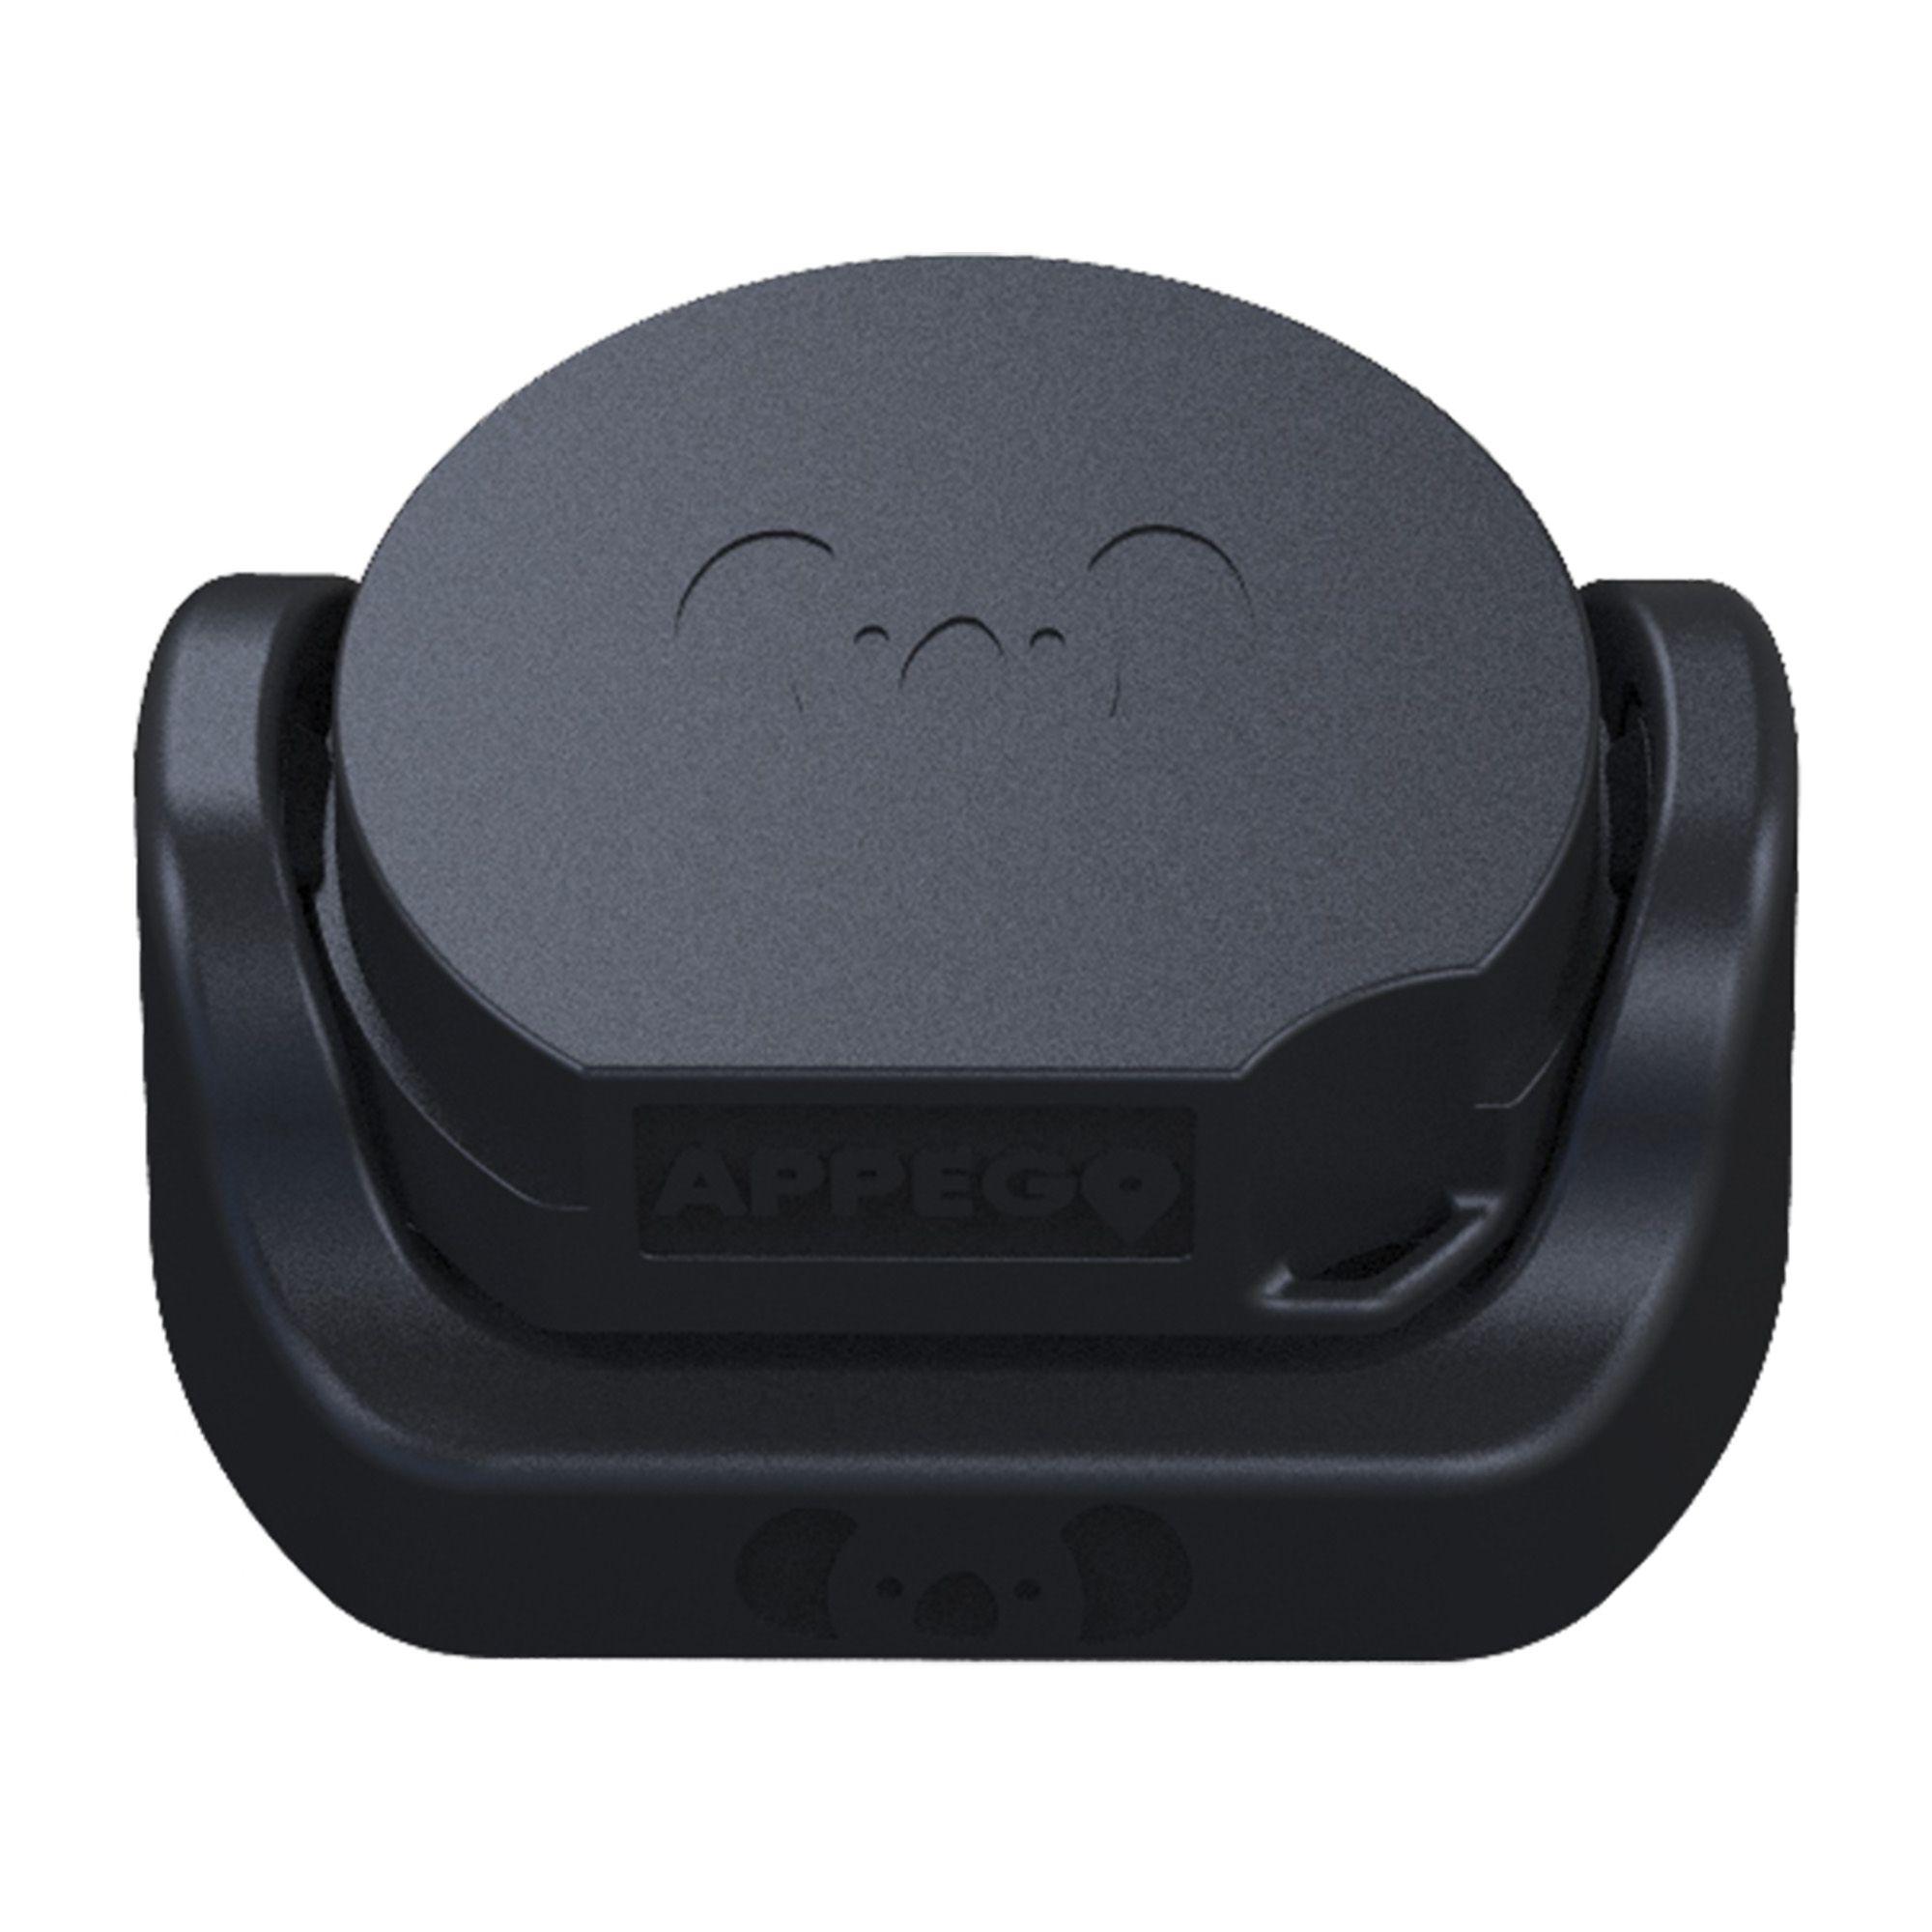 Rastreador Portátil Appego GPS